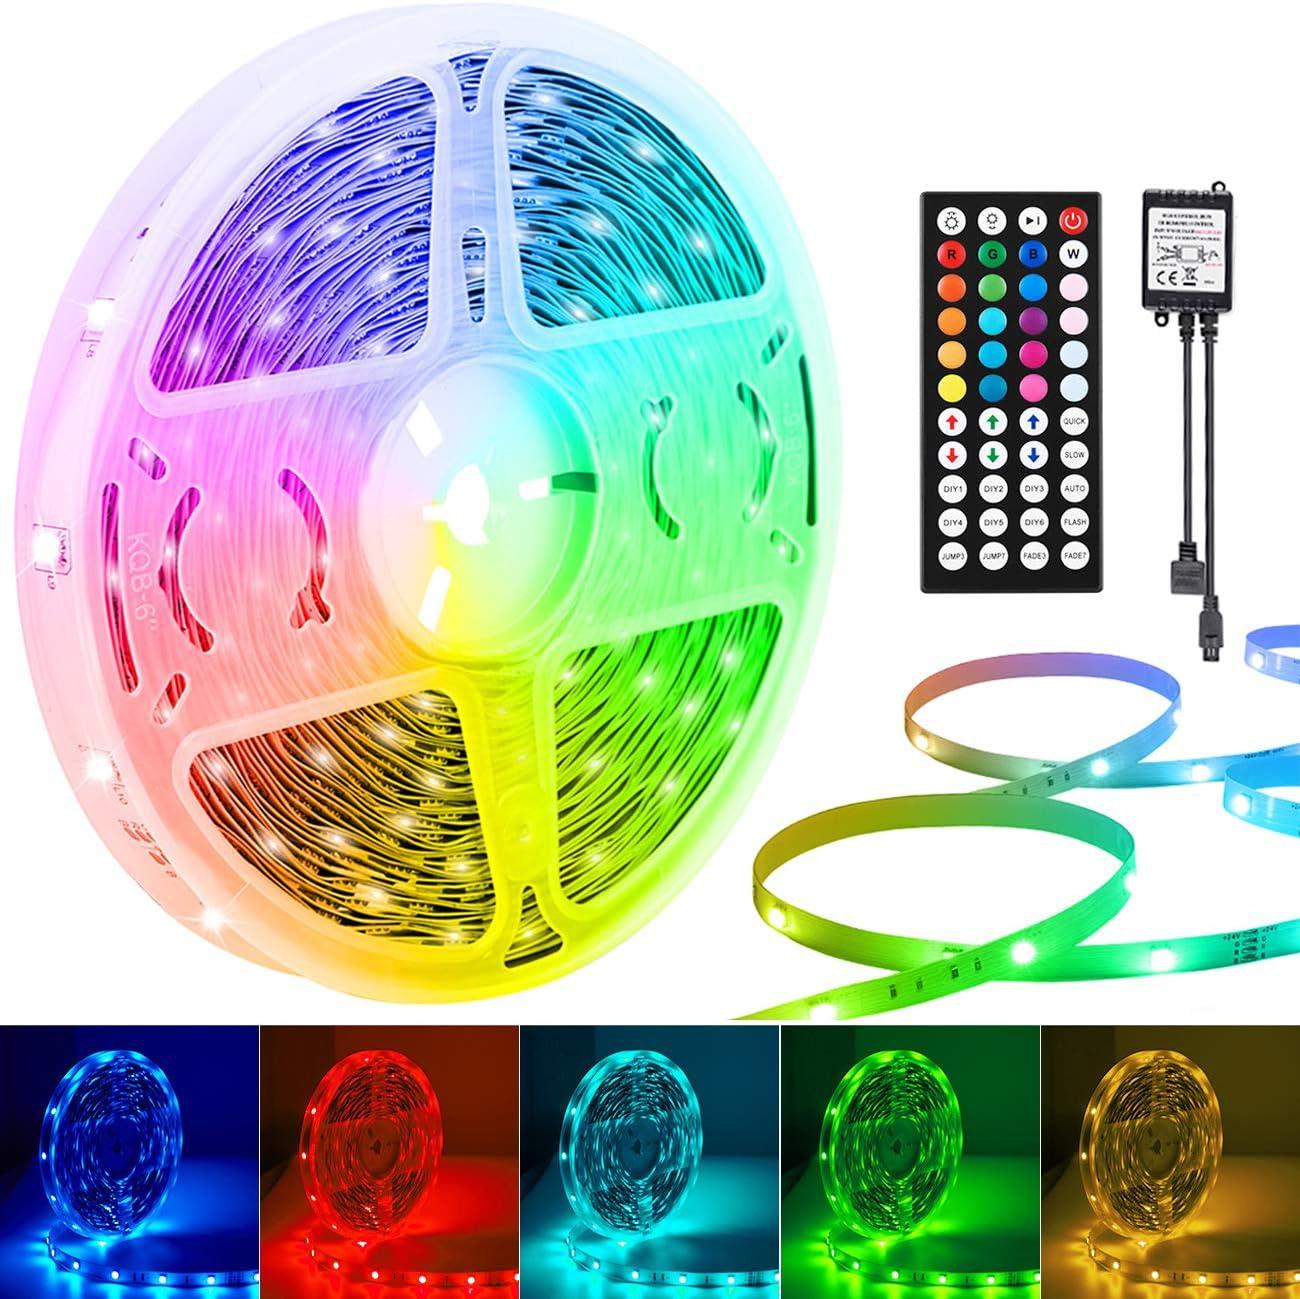 Details about  /5-30M RGB 5050SMD LED Stripe Streifen Lichtband WiFi Alexa Controller Netzteil